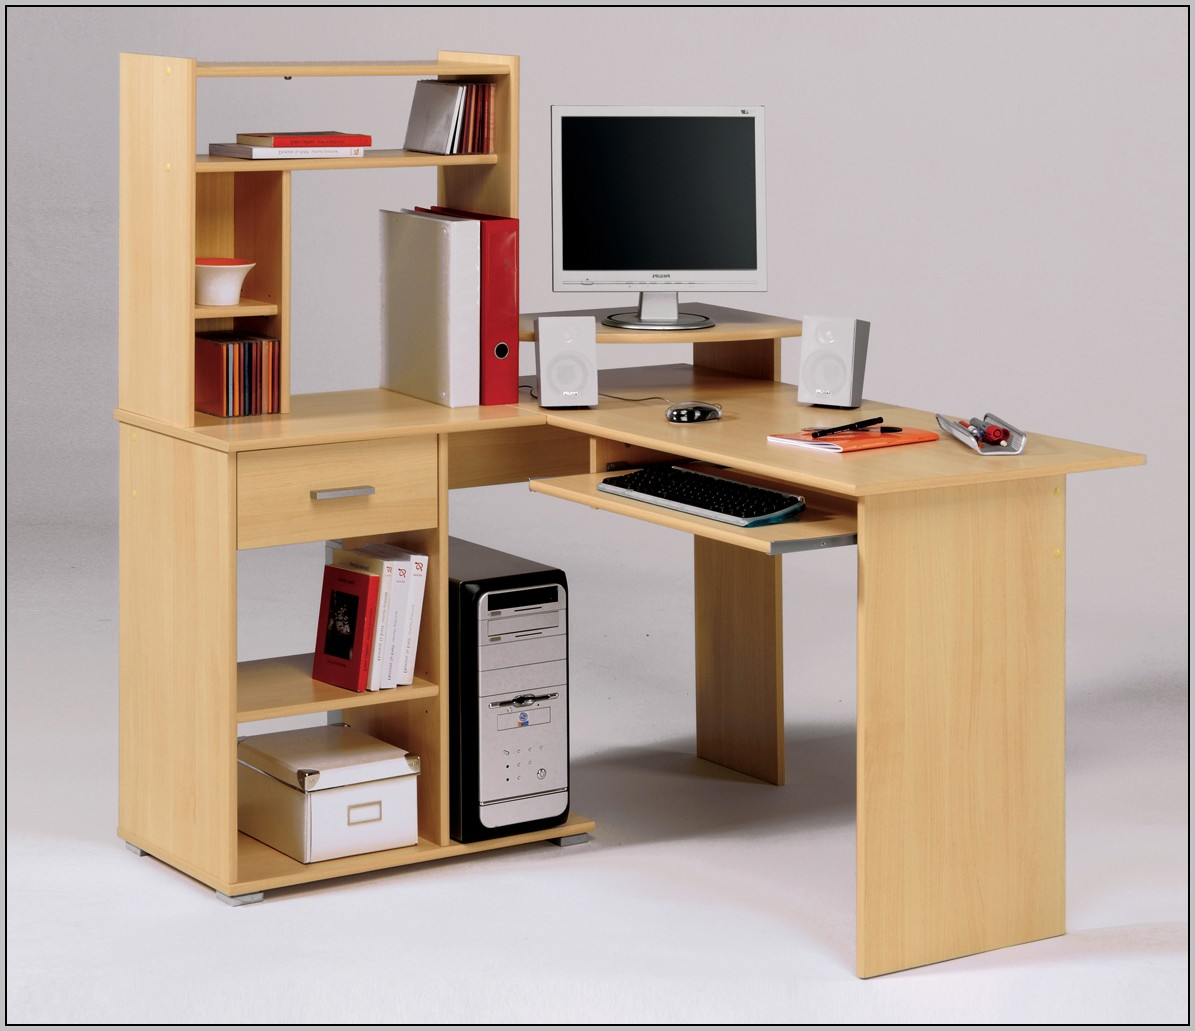 Small Desk Ikea Uk  Desk  Home Design Ideas #6zdaerjdbx19695. Small Modern Desk. Desk Calendar Protector. Desk Mount Keyboard Arm. Desk Exercise Equipment. Extendable Desk. Wrought Iron Table Lamps. L Office Desk. Wood Nightstands With Drawers